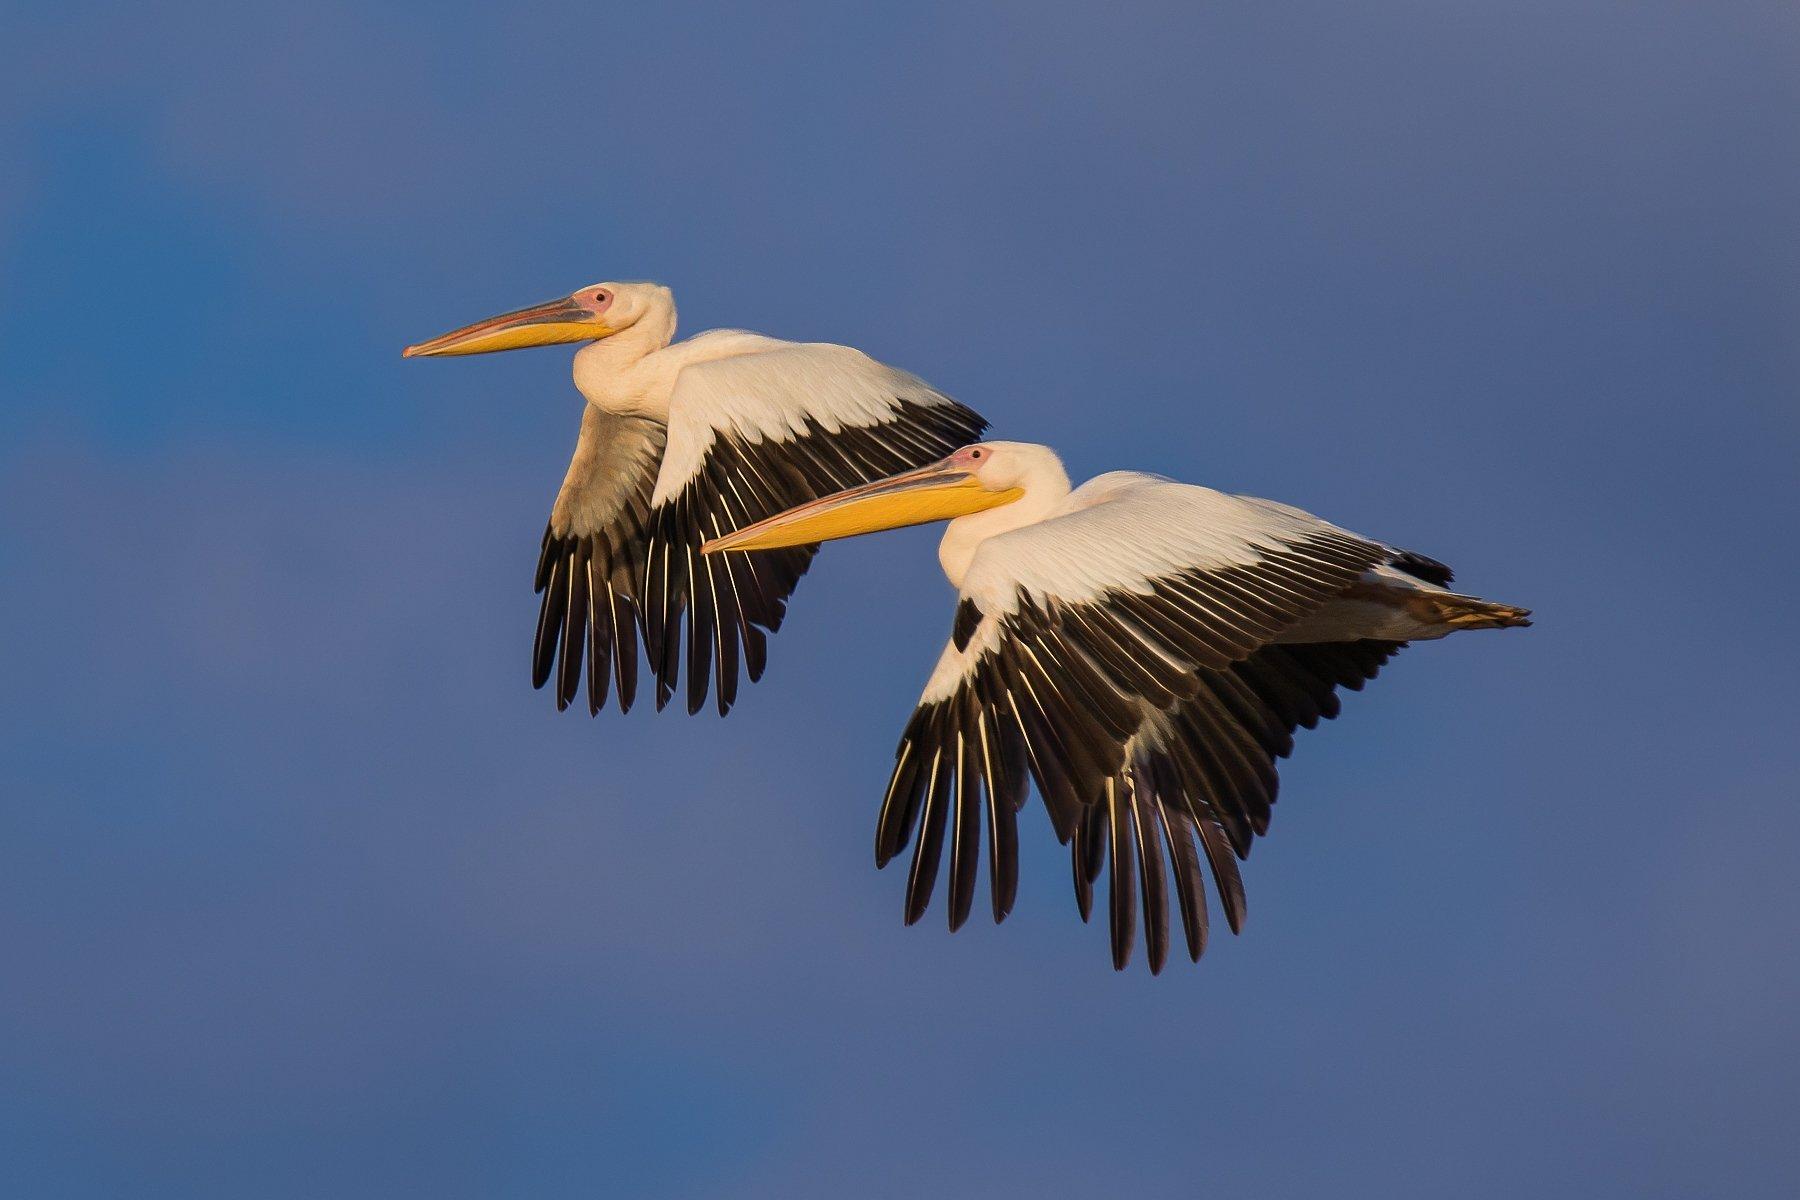 небо, пара, пеликаны, полёт, природа, птицы, Наталья Рублина